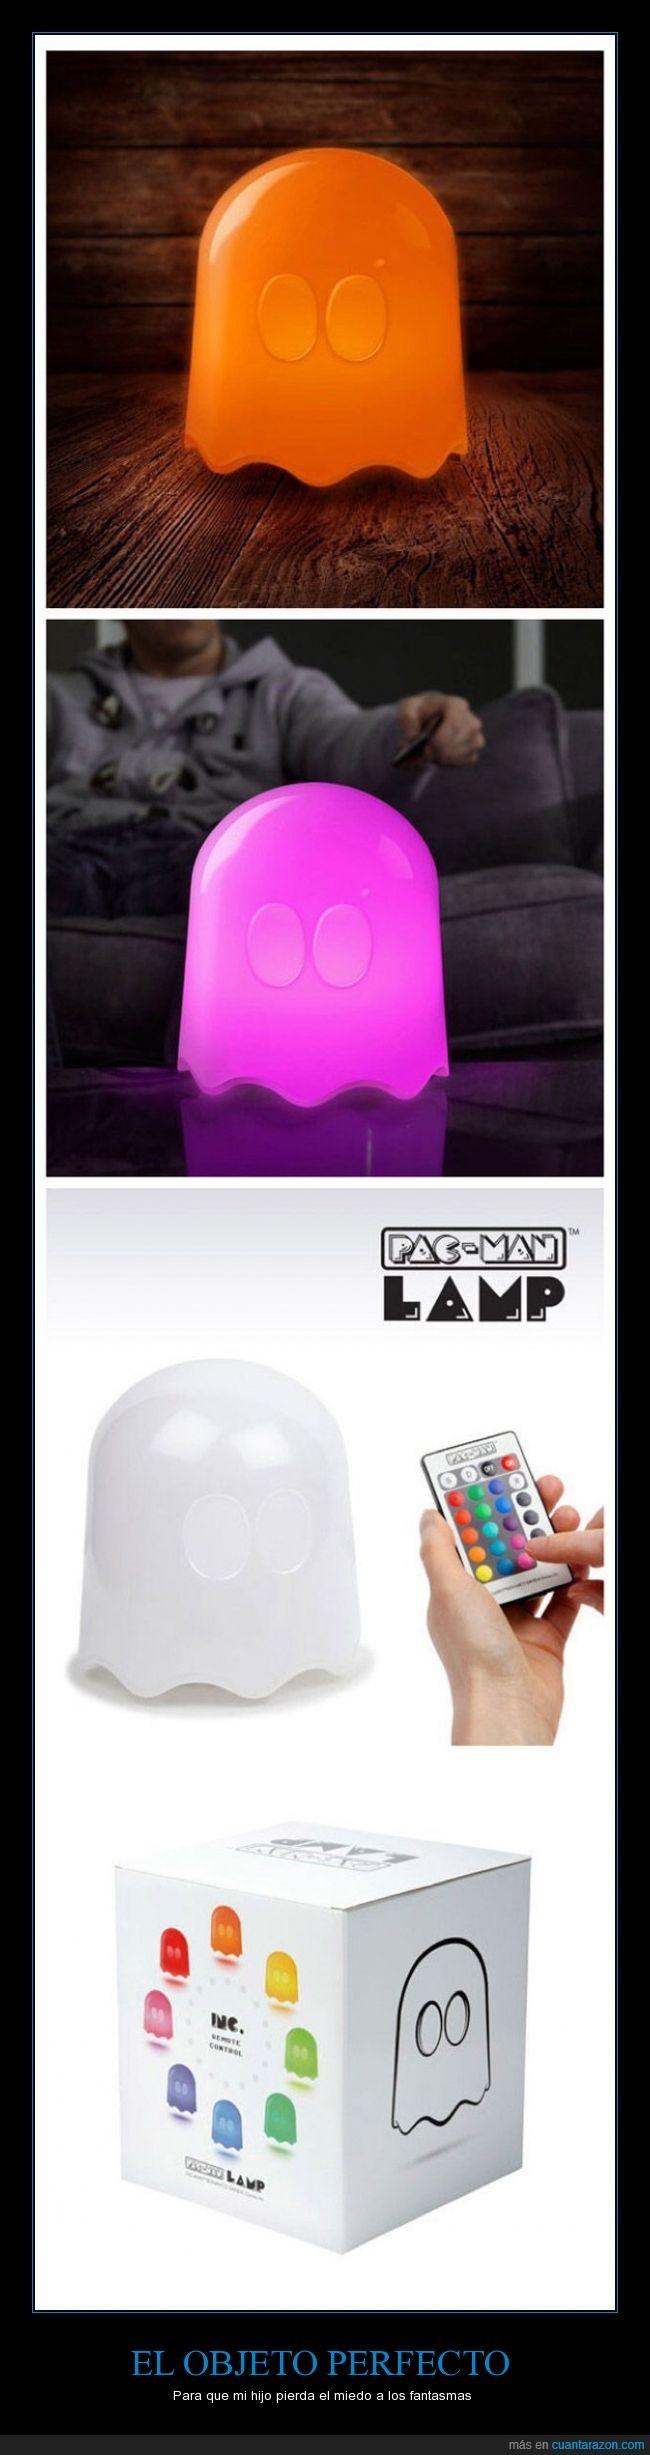 colores,fantasma,hijo,lamp,lampara,luz,miedo,pac man,pac-man,pacman